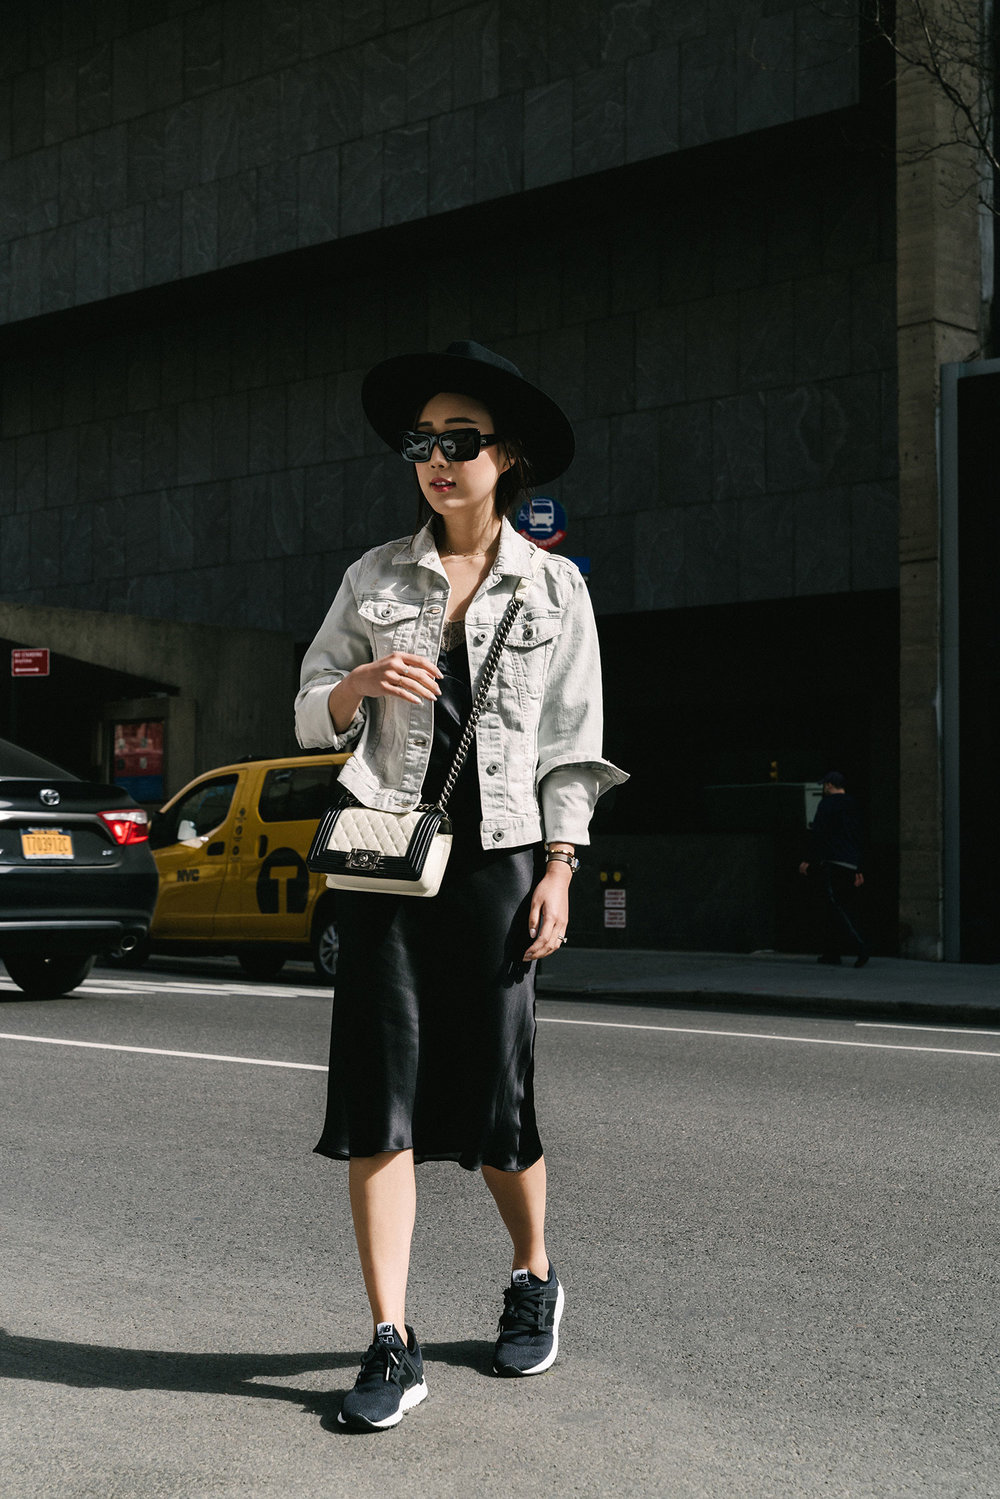 Uniqlo Jacket ,  Maison Margiela Dress ,  New Balance Sneakers , Chanel Bag, Chloé Sunglasses,  Janessa Leone Hat